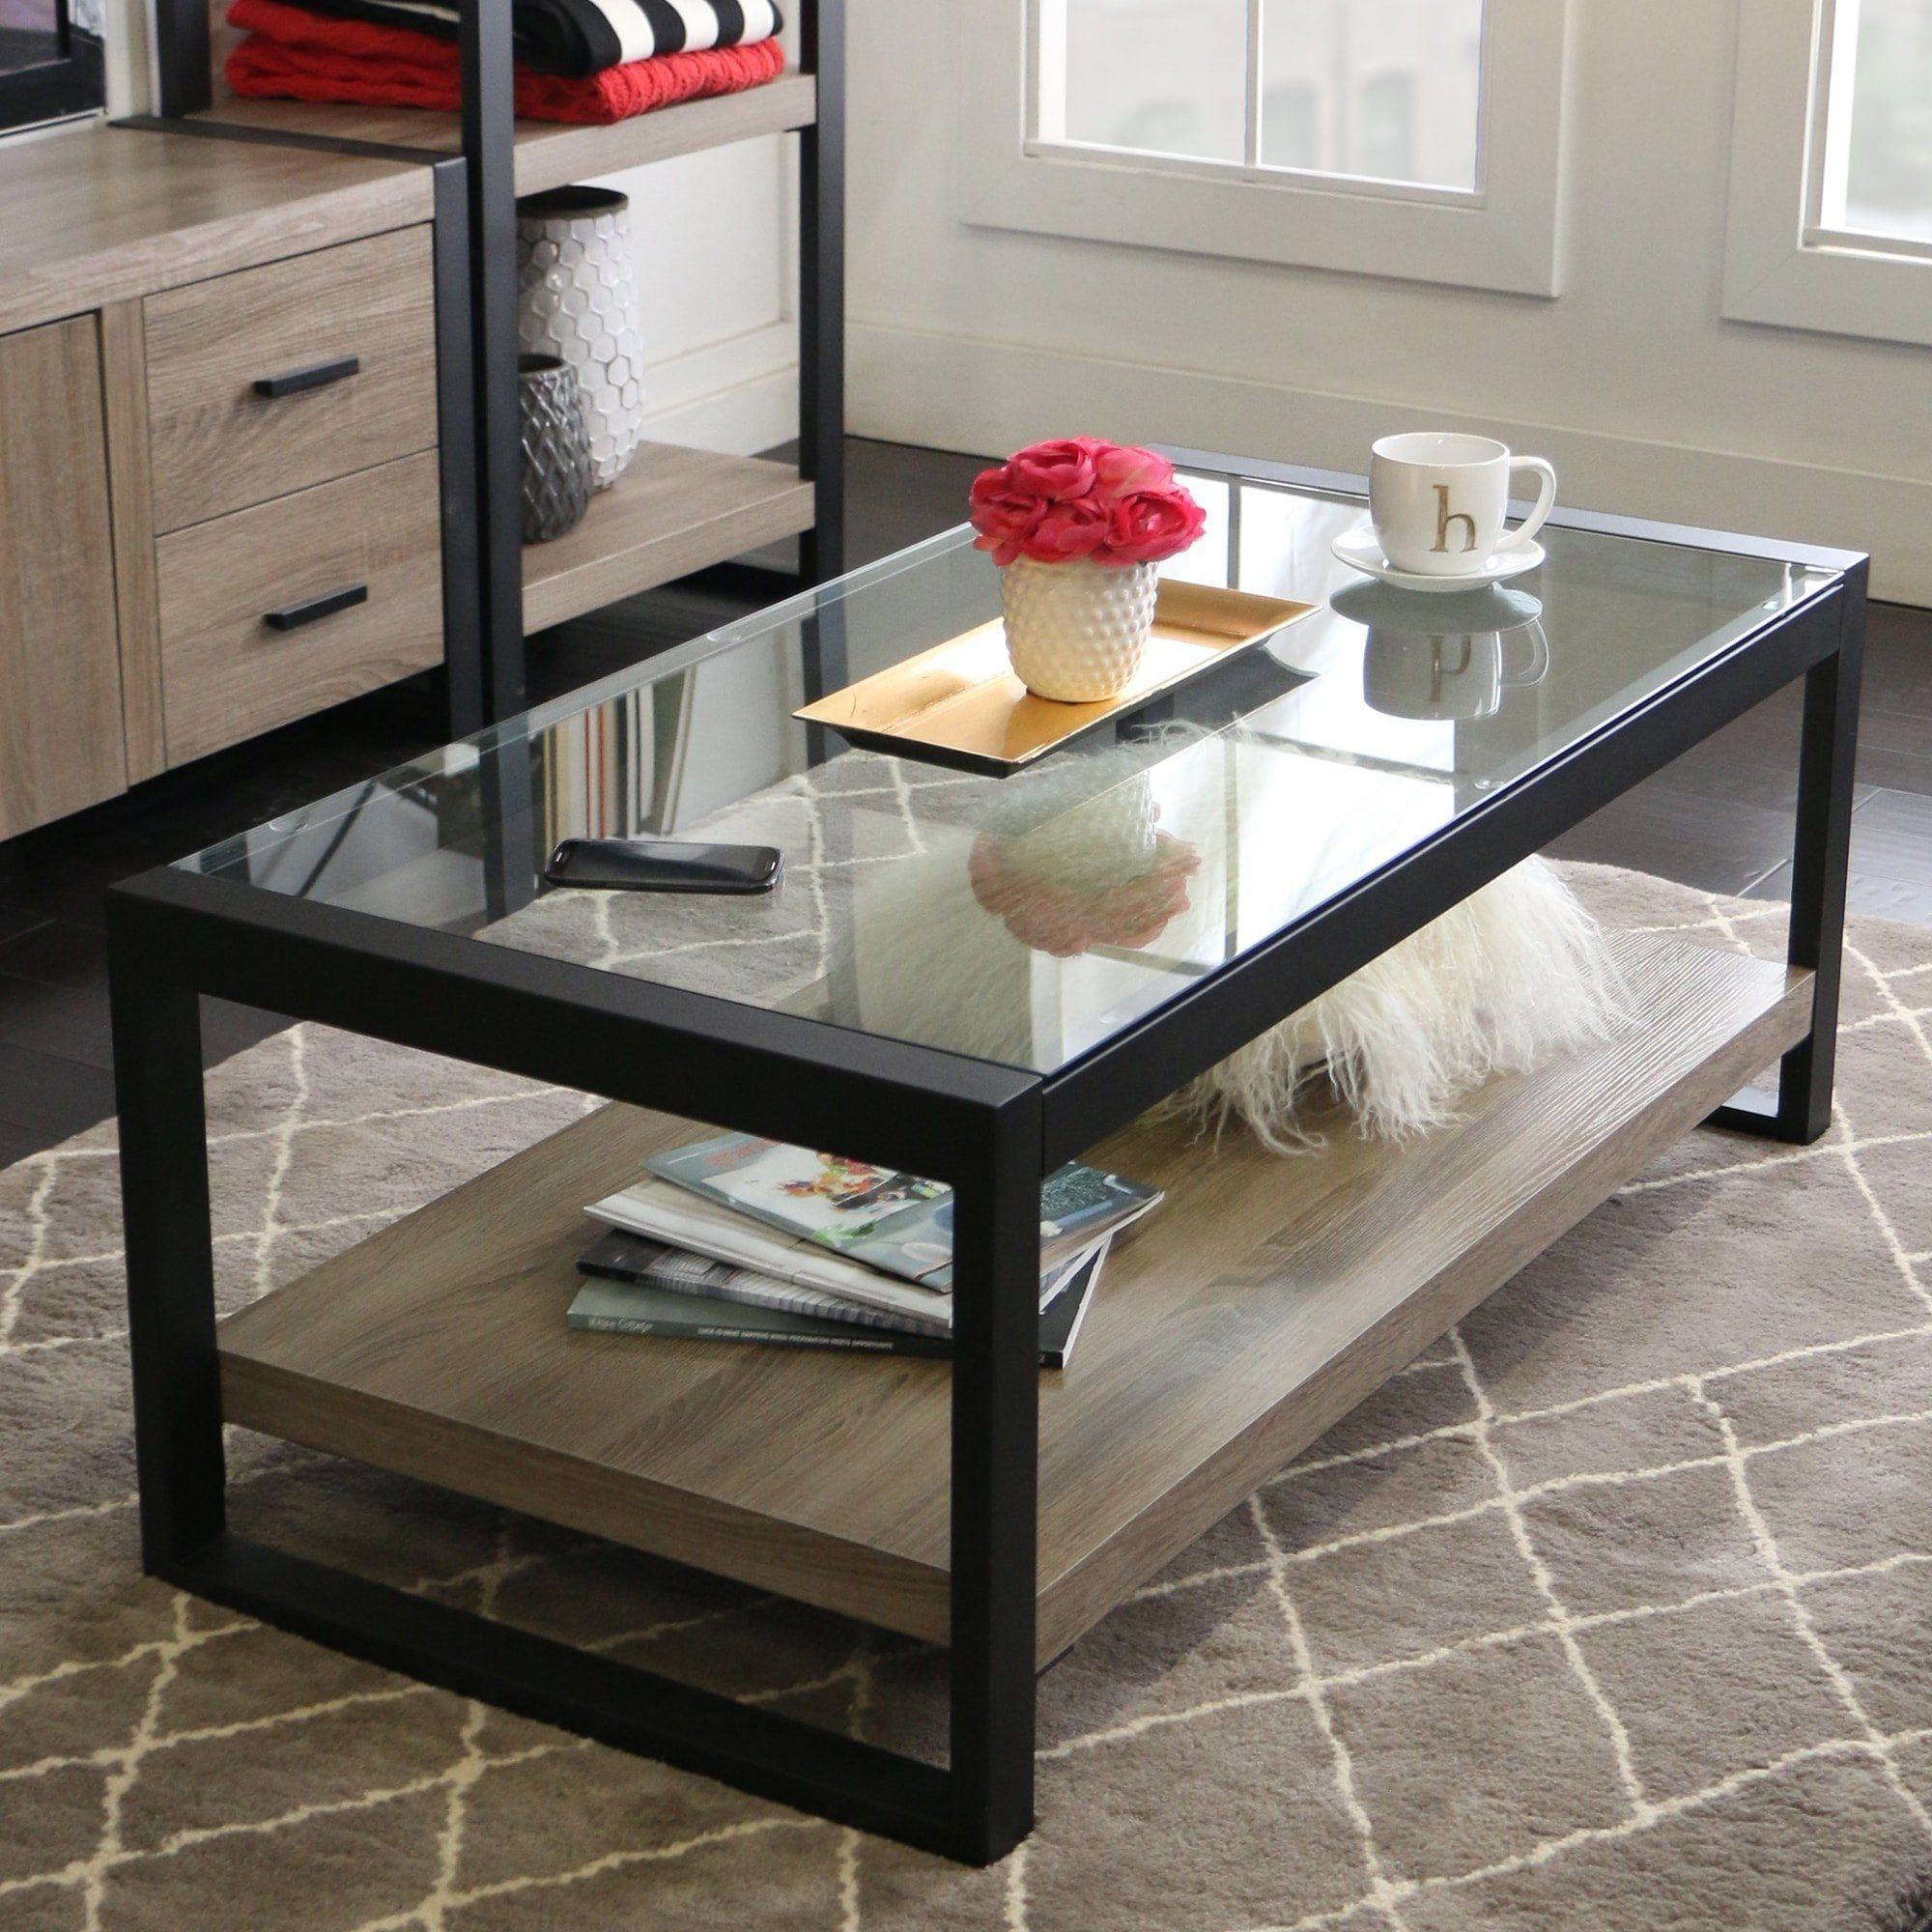 24 X 24 Coffee Table.48 Urban Blend Coffee Table With Glass Top 48 X 24 X 18h Tan